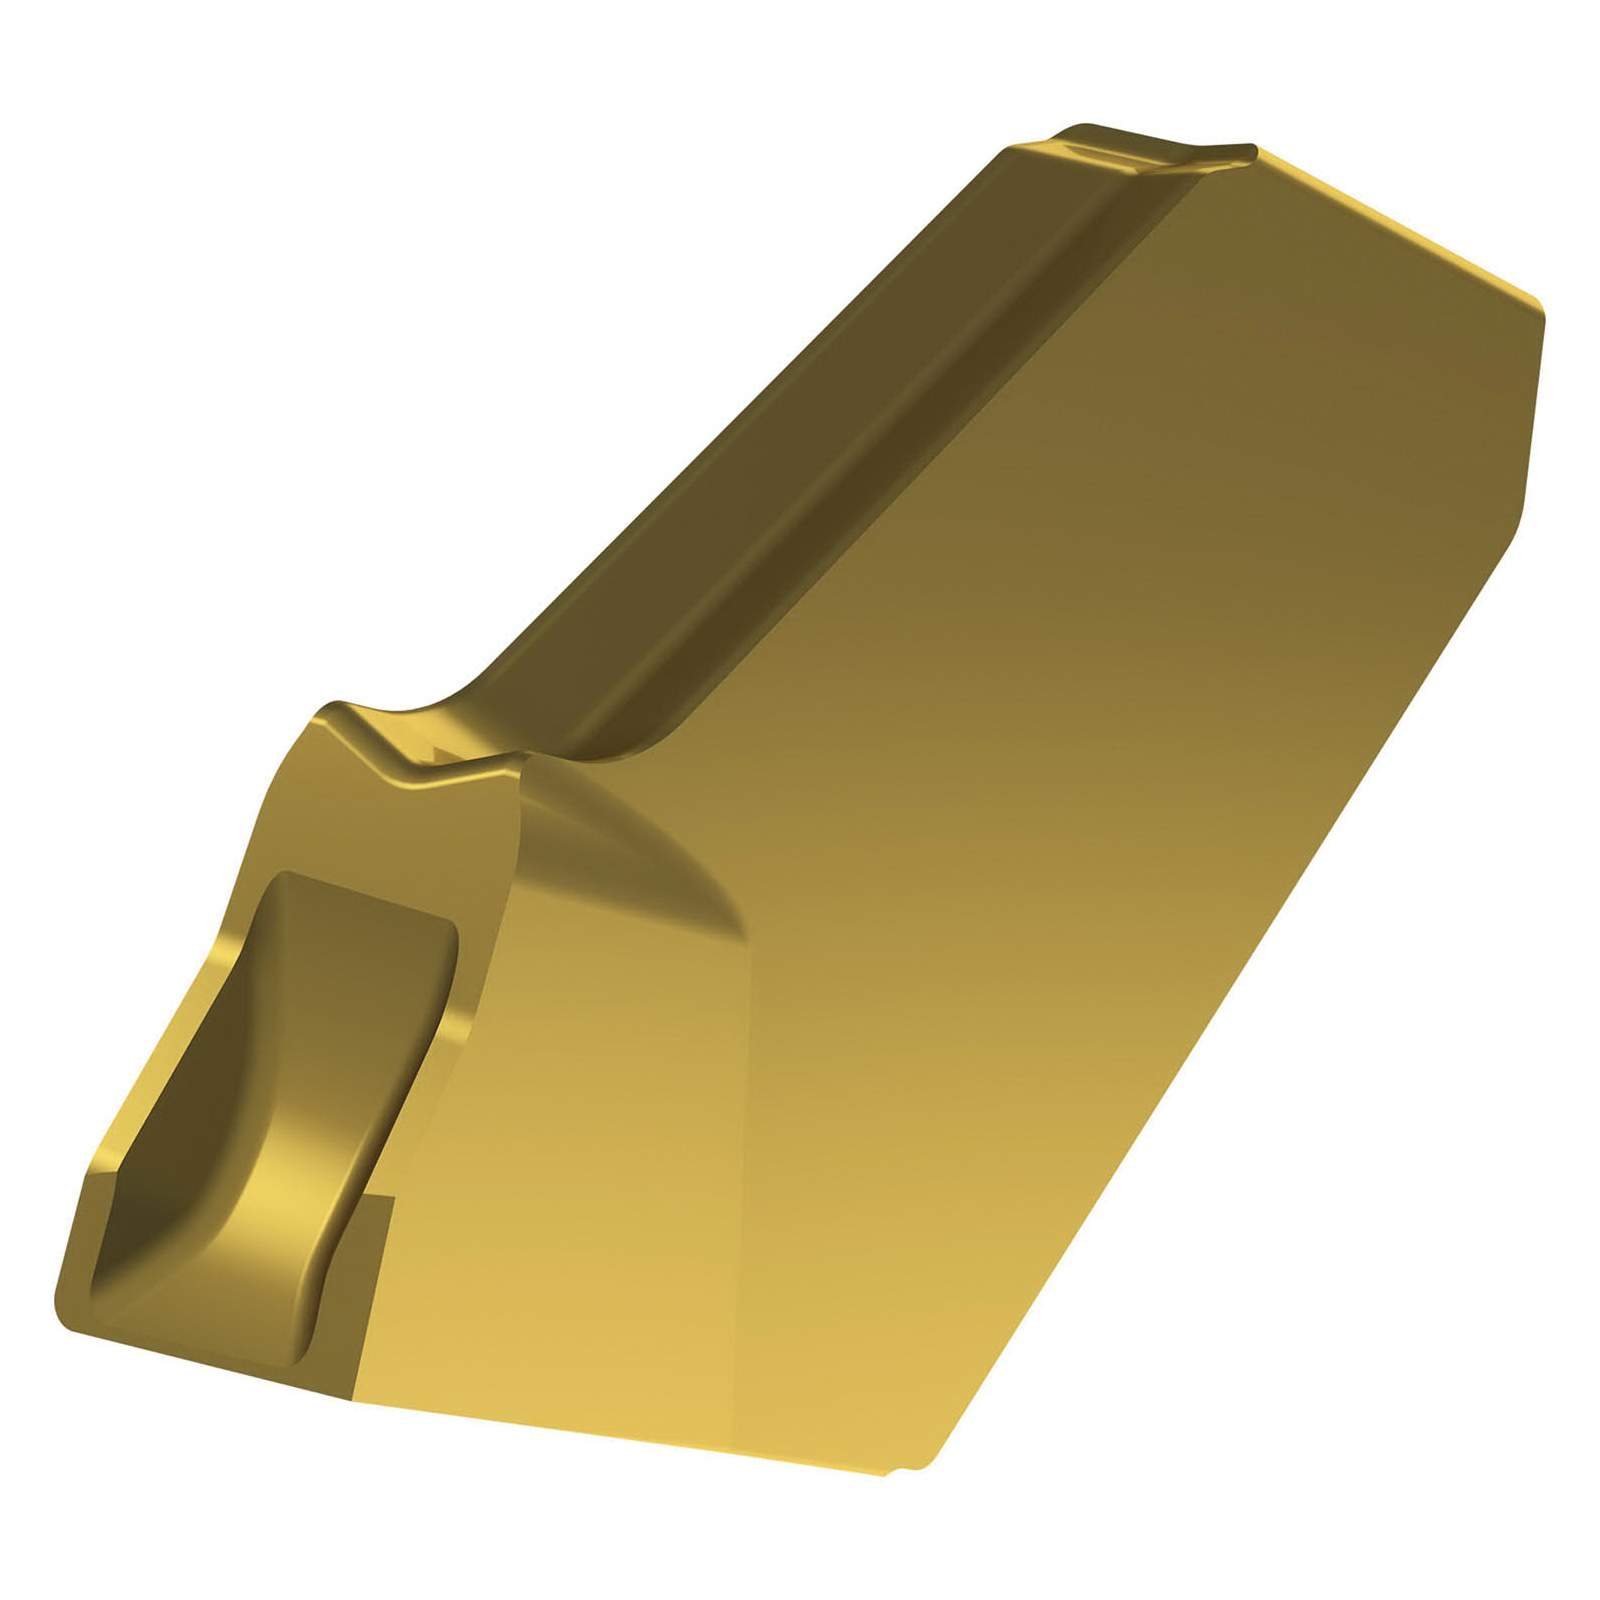 Pramet 7156197 Turning Insert, ANSI Code: CNMG 432-NM:T7325, CNMG Insert, Material Grade: M, P, S, 432 Insert, Diamond Shape, 12 Seat, Negative Rake, For Use On Stainless Steel, Steel and Titanium/Super Alloys, Carbide, Manufacturer's Grade: T7325